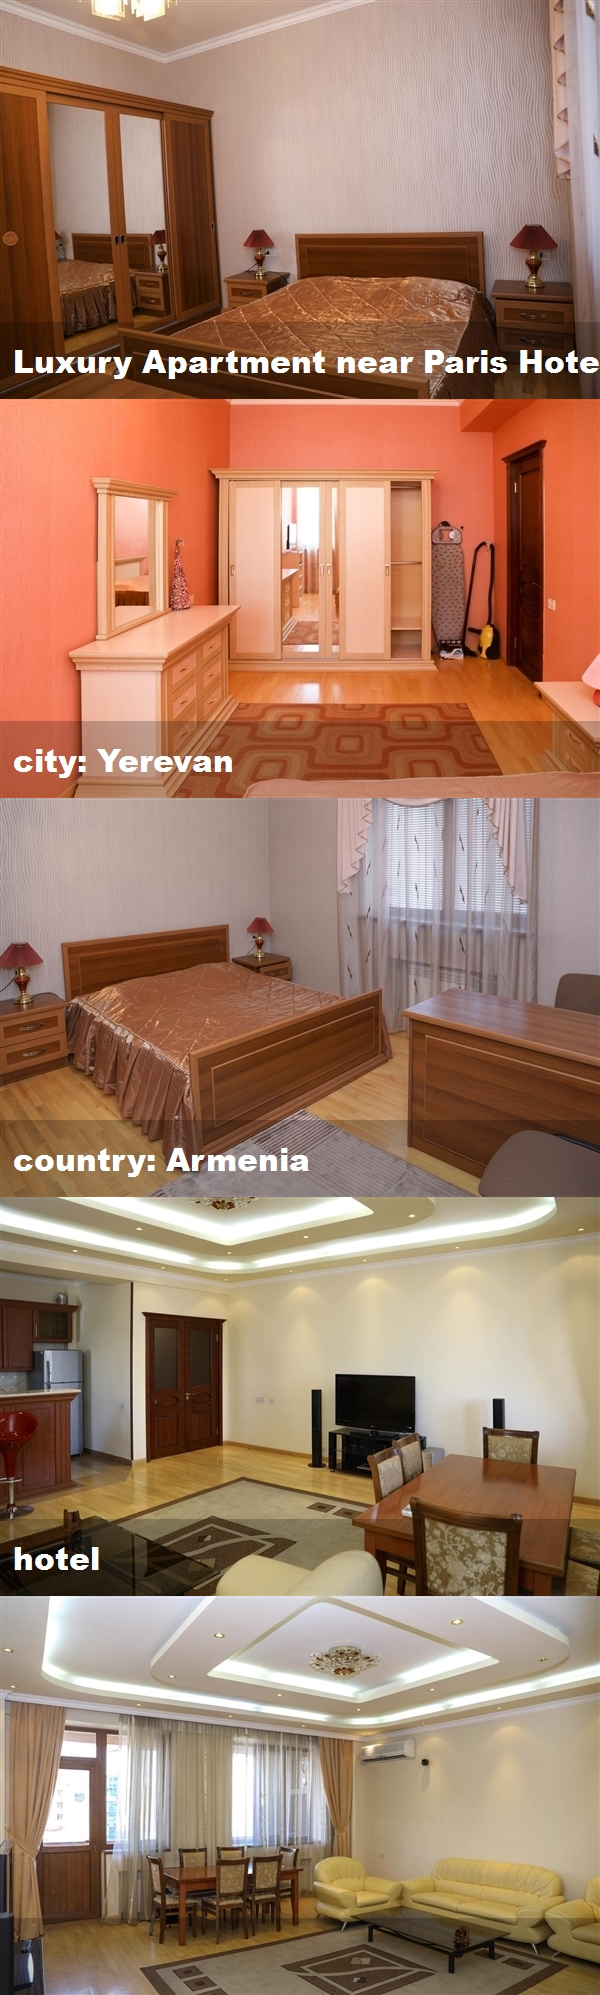 Luxury Apartment near Paris Hotel, city Yerevan, country